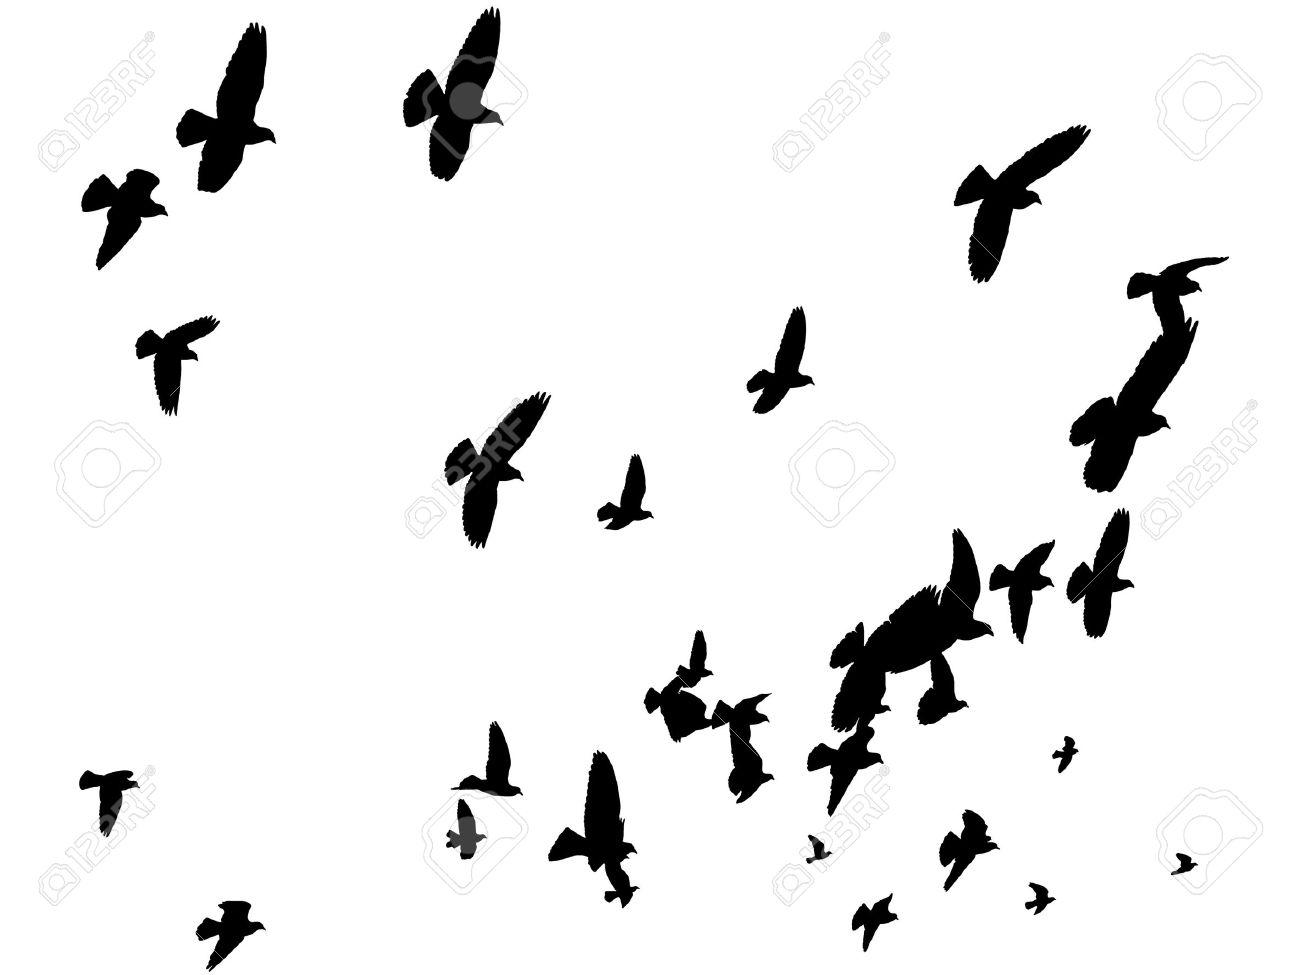 1300x975 8izrbjz8t For Flying Bird Silhouette Clip Art